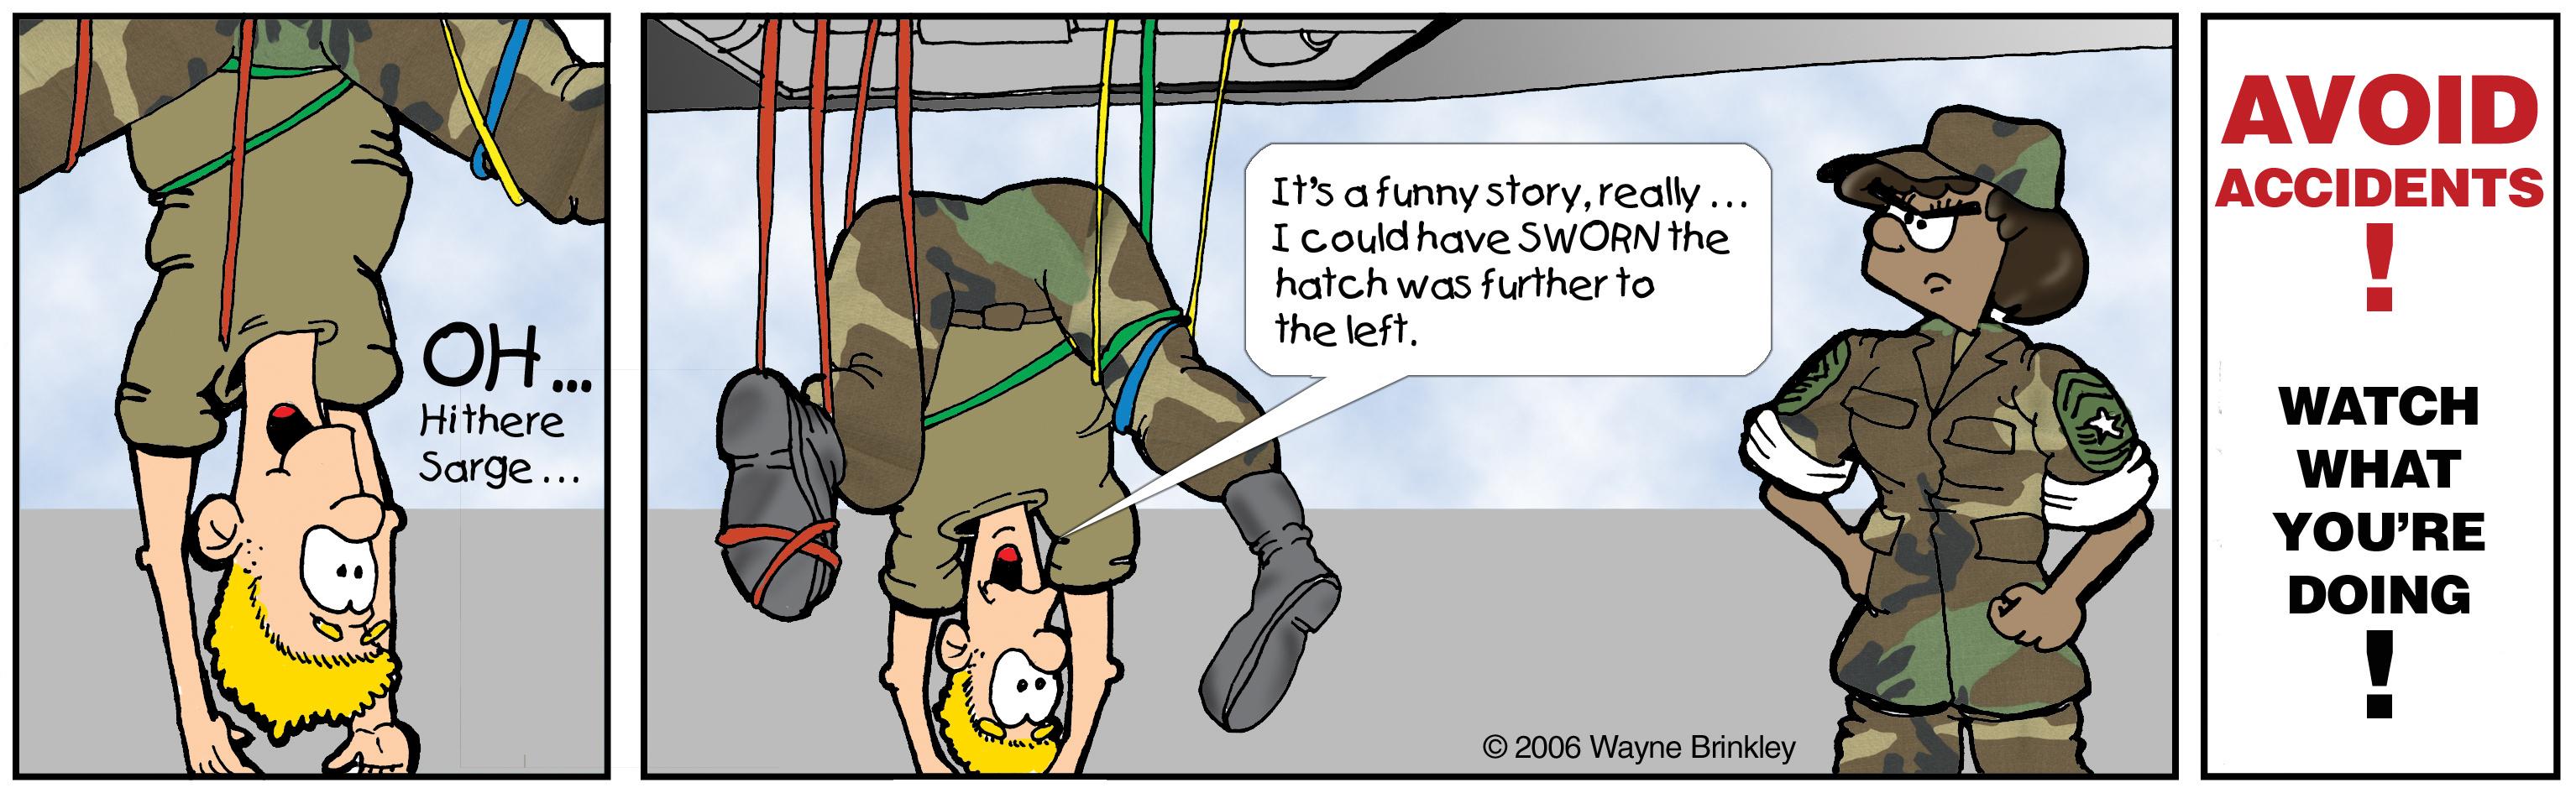 Hanging oops Cartoon